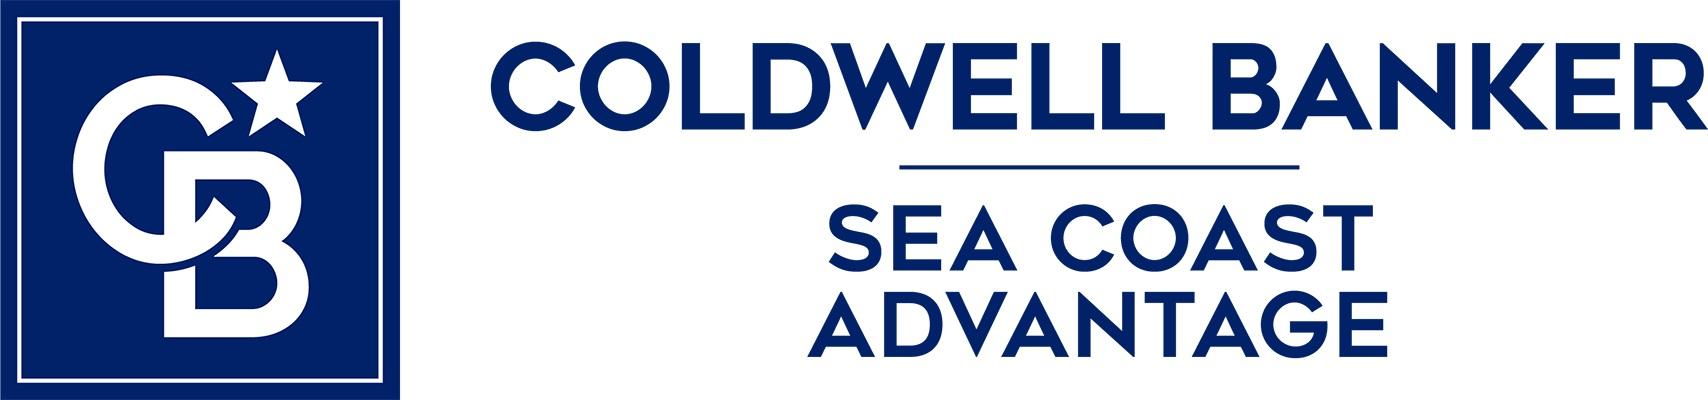 Tom Guzulaitis - Coldwell Banker Sea Coast Advantage Realty Logo